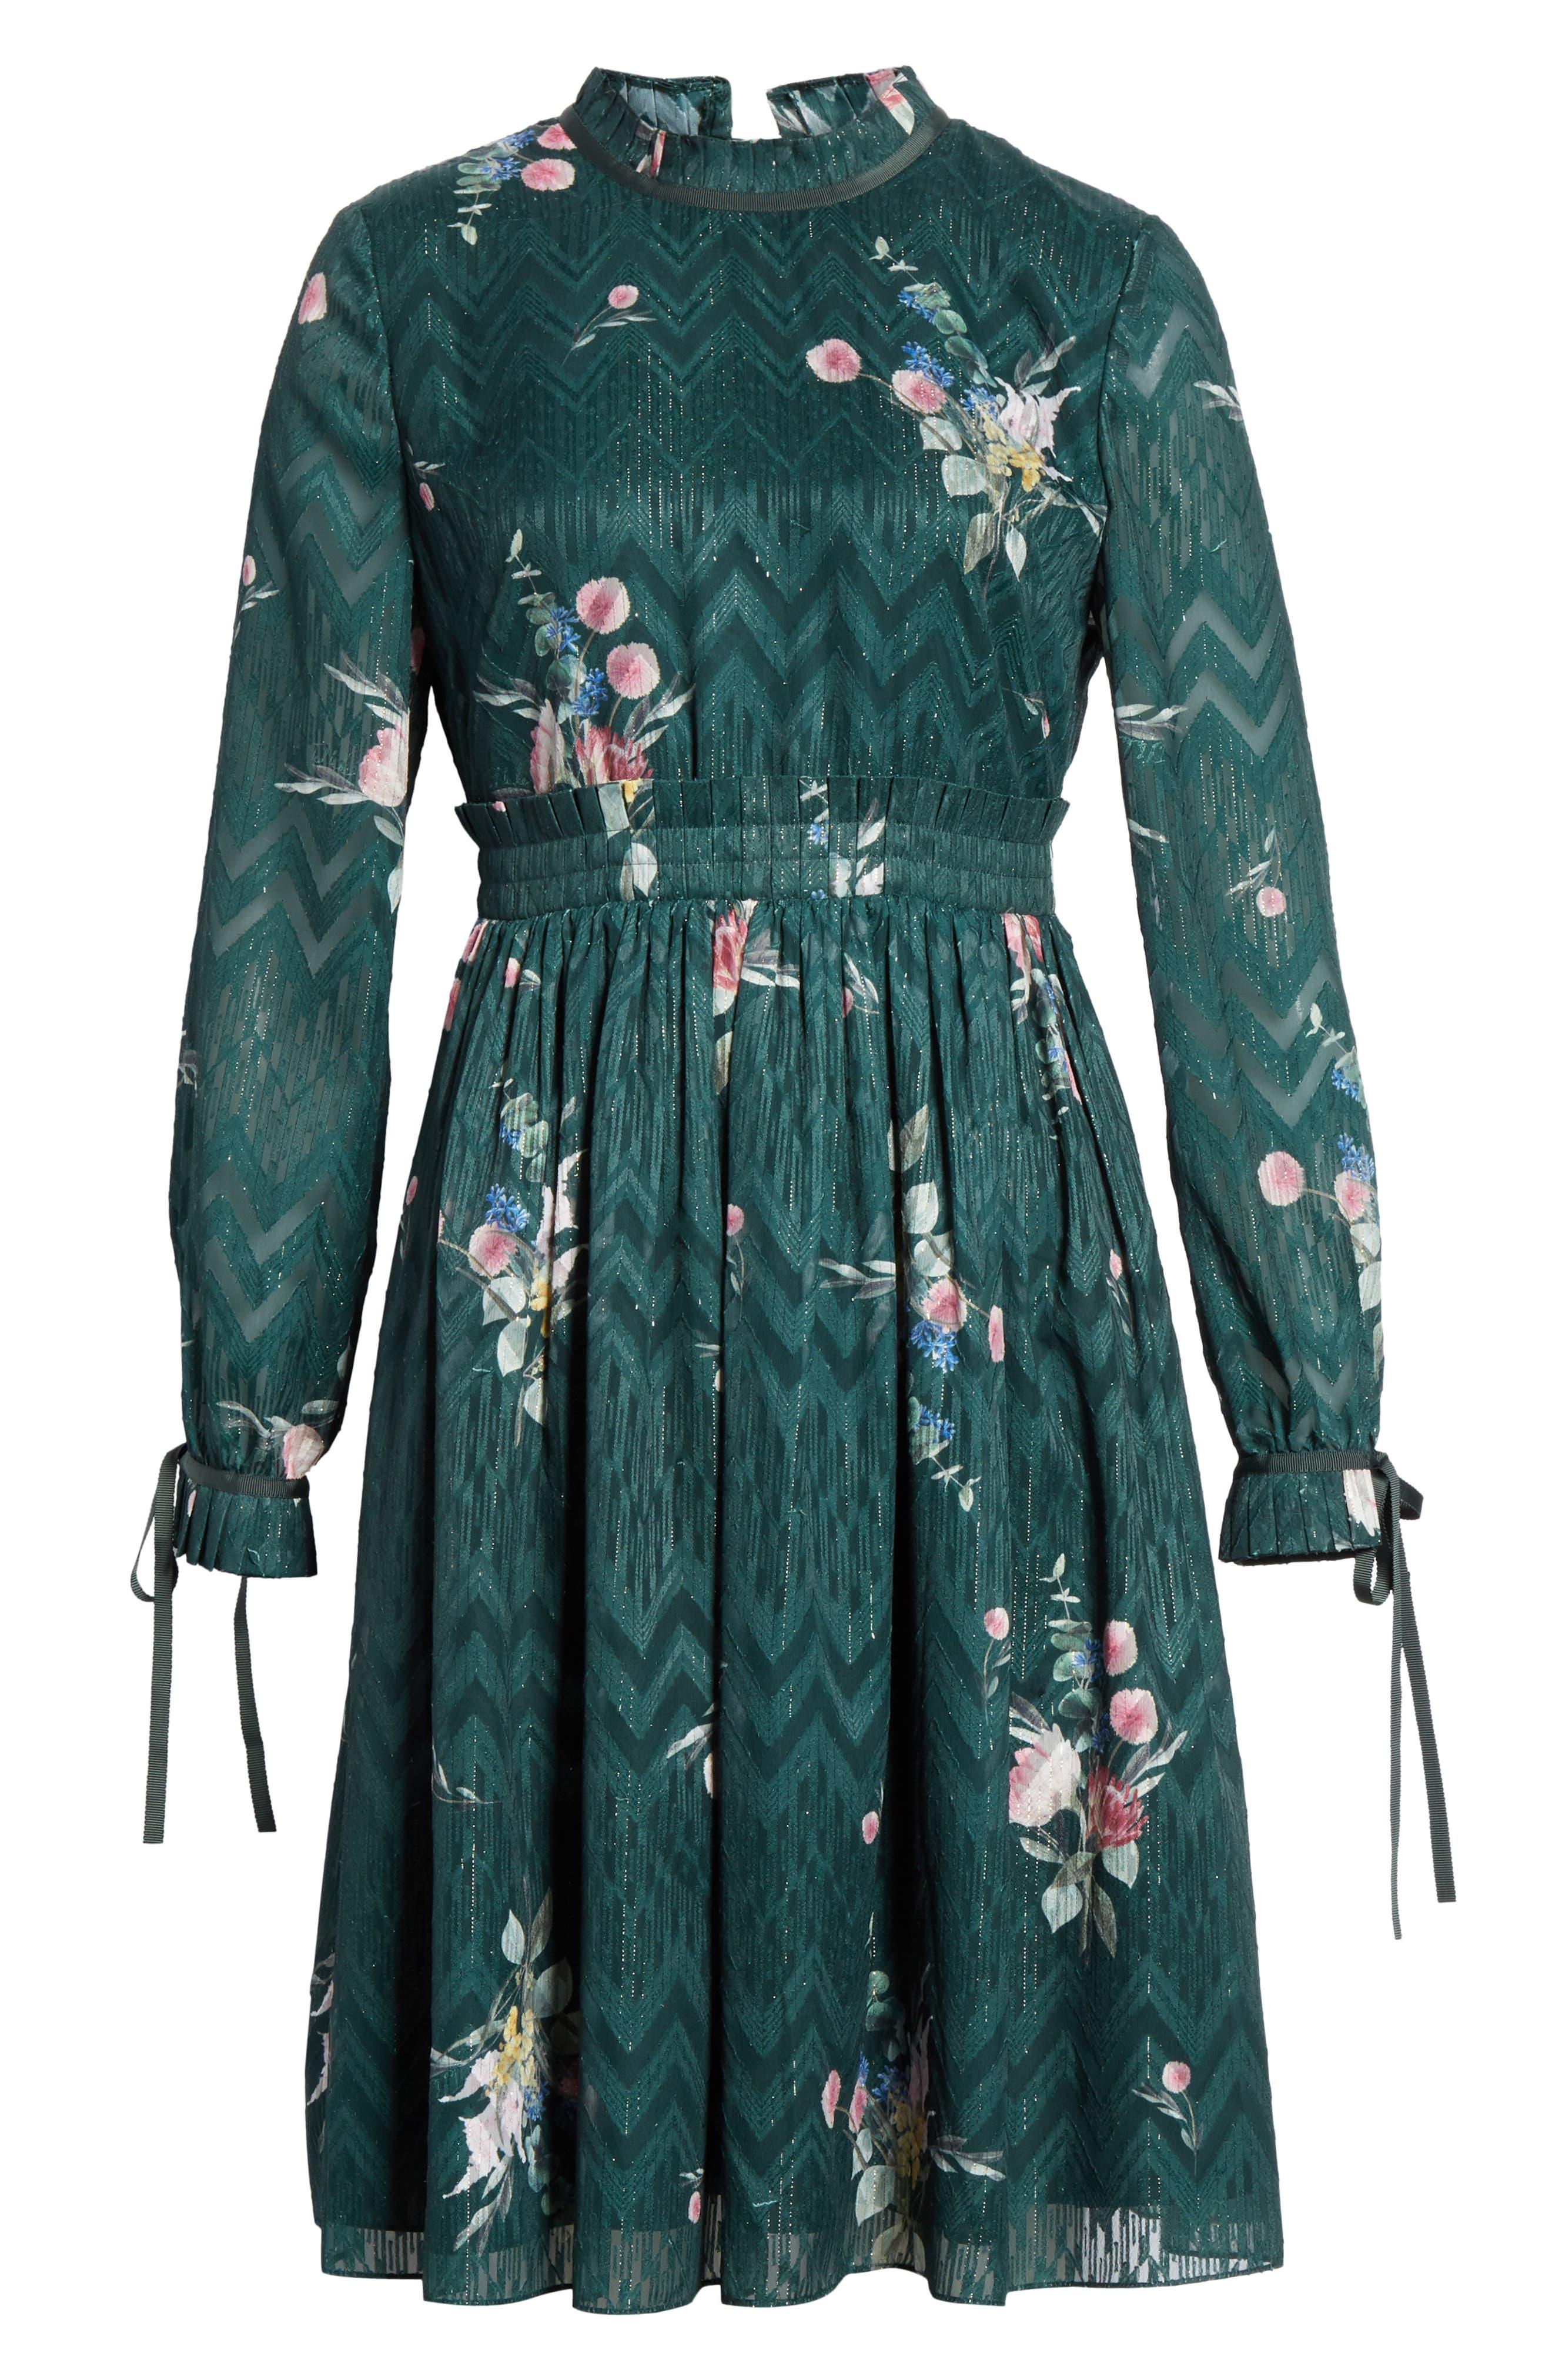 TED BAKER LONDON, Sofiya Floral Ribbon Tie Dress, Alternate thumbnail 7, color, DARK GREEN